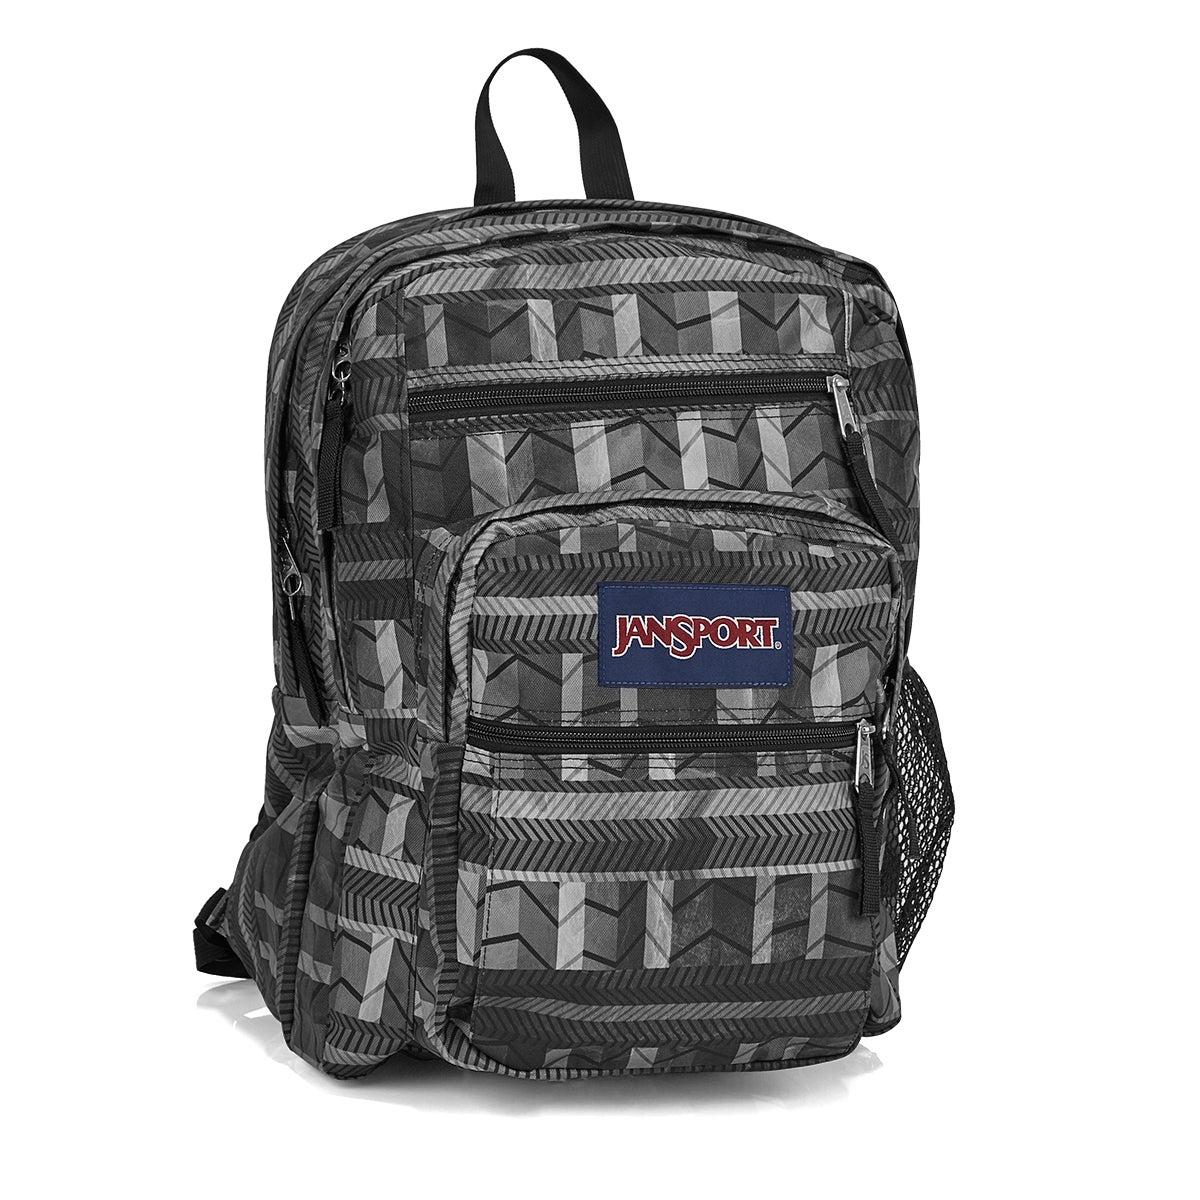 Unisex BIG STUDENT chevrons backpack